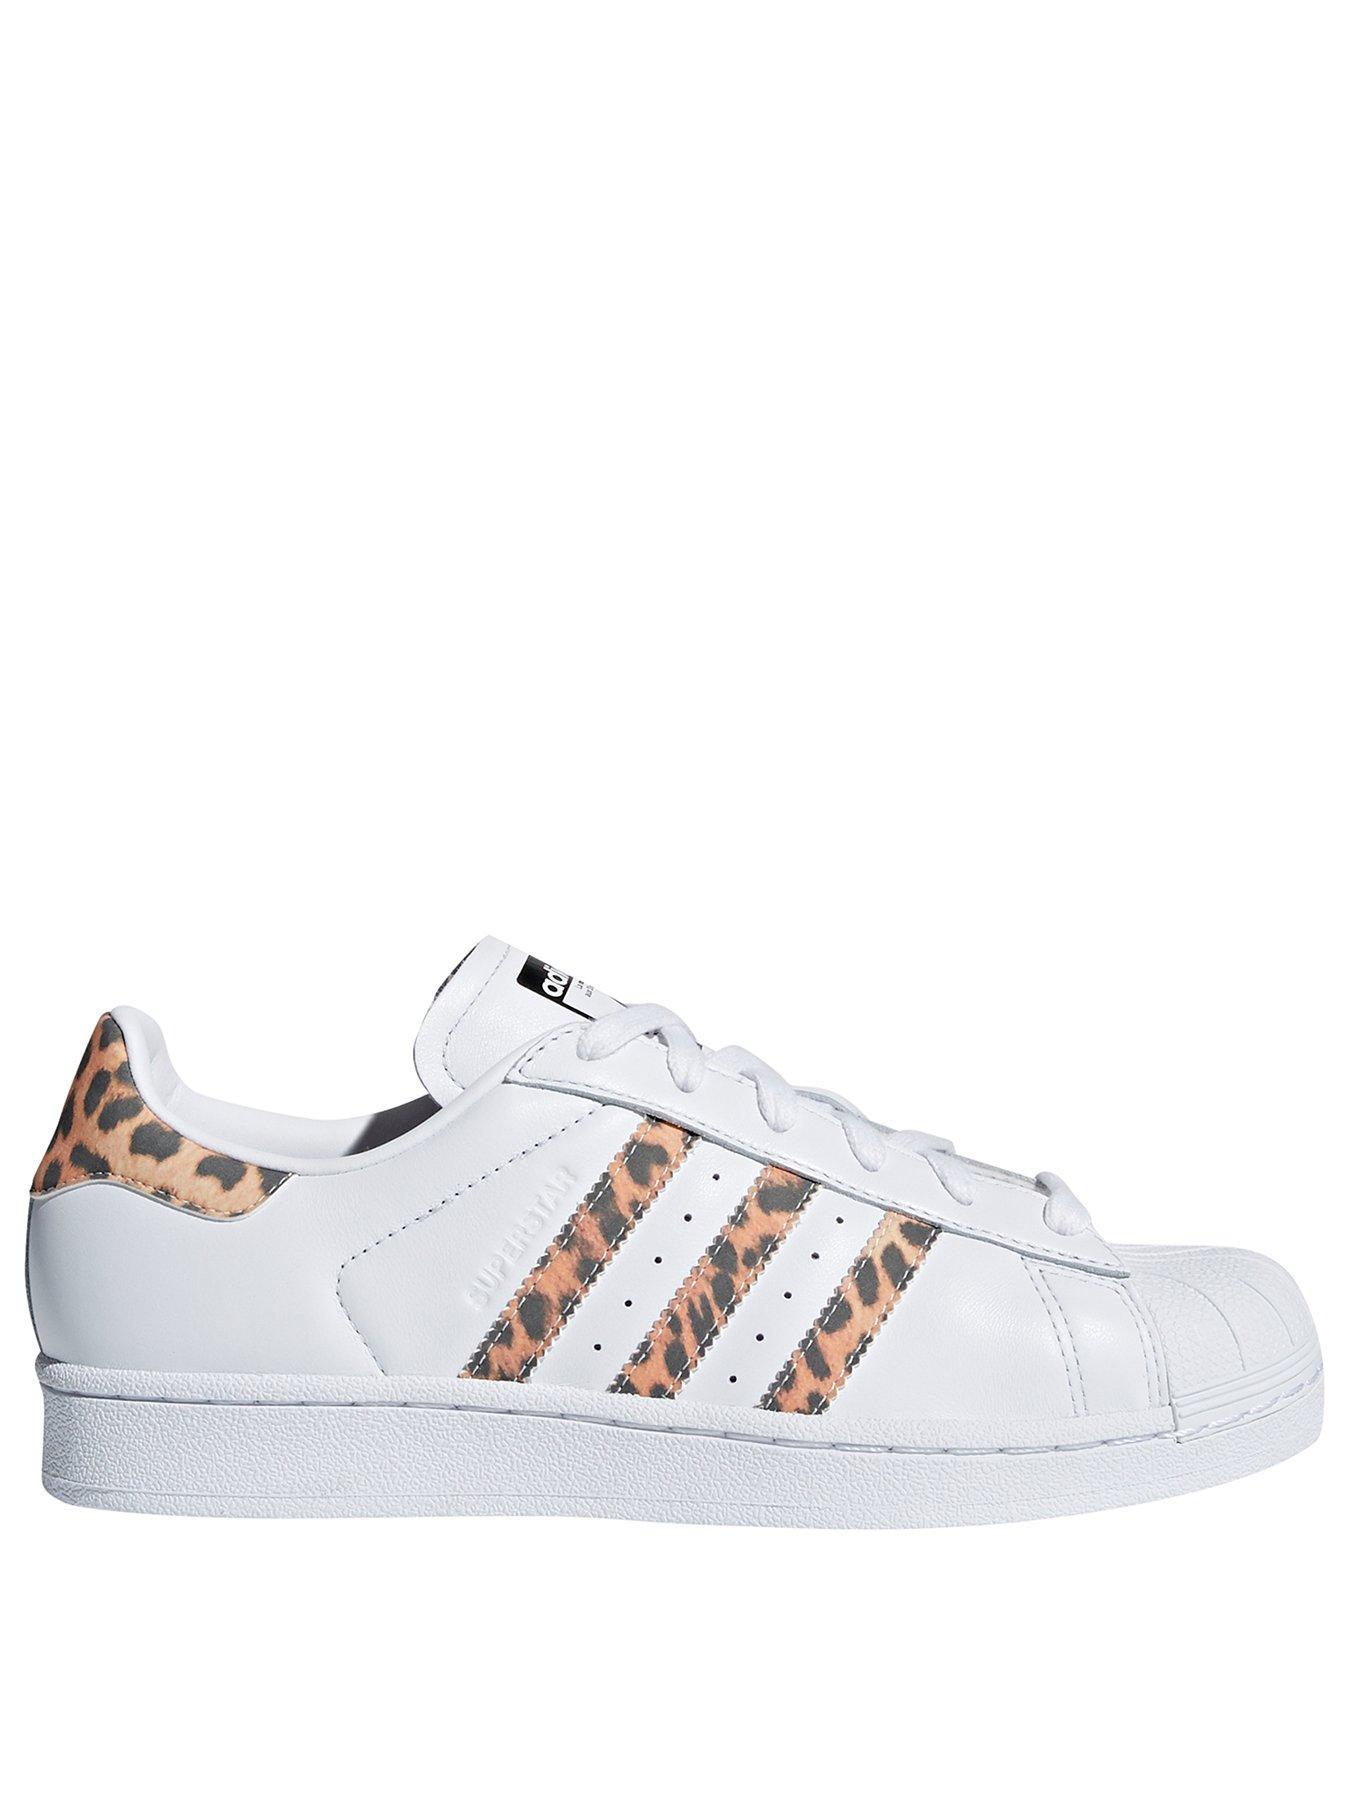 Adidas superstar bianco / leopardato originali.